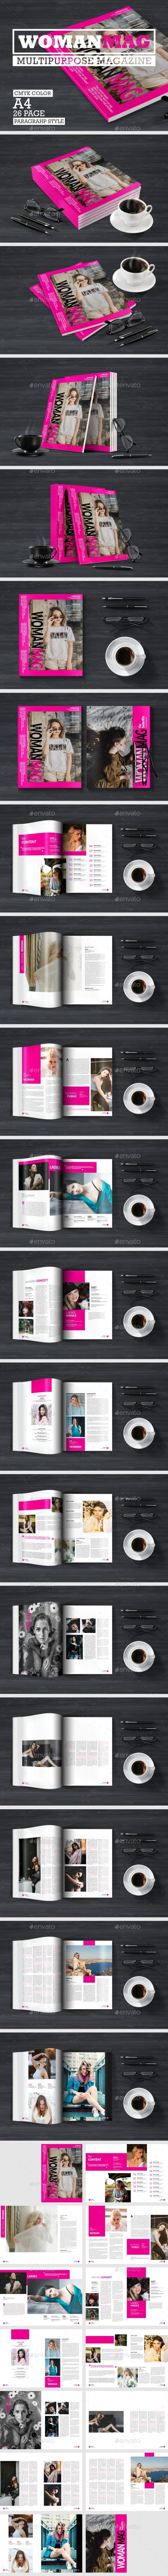 Woman Magazine - Magazines Print Templates